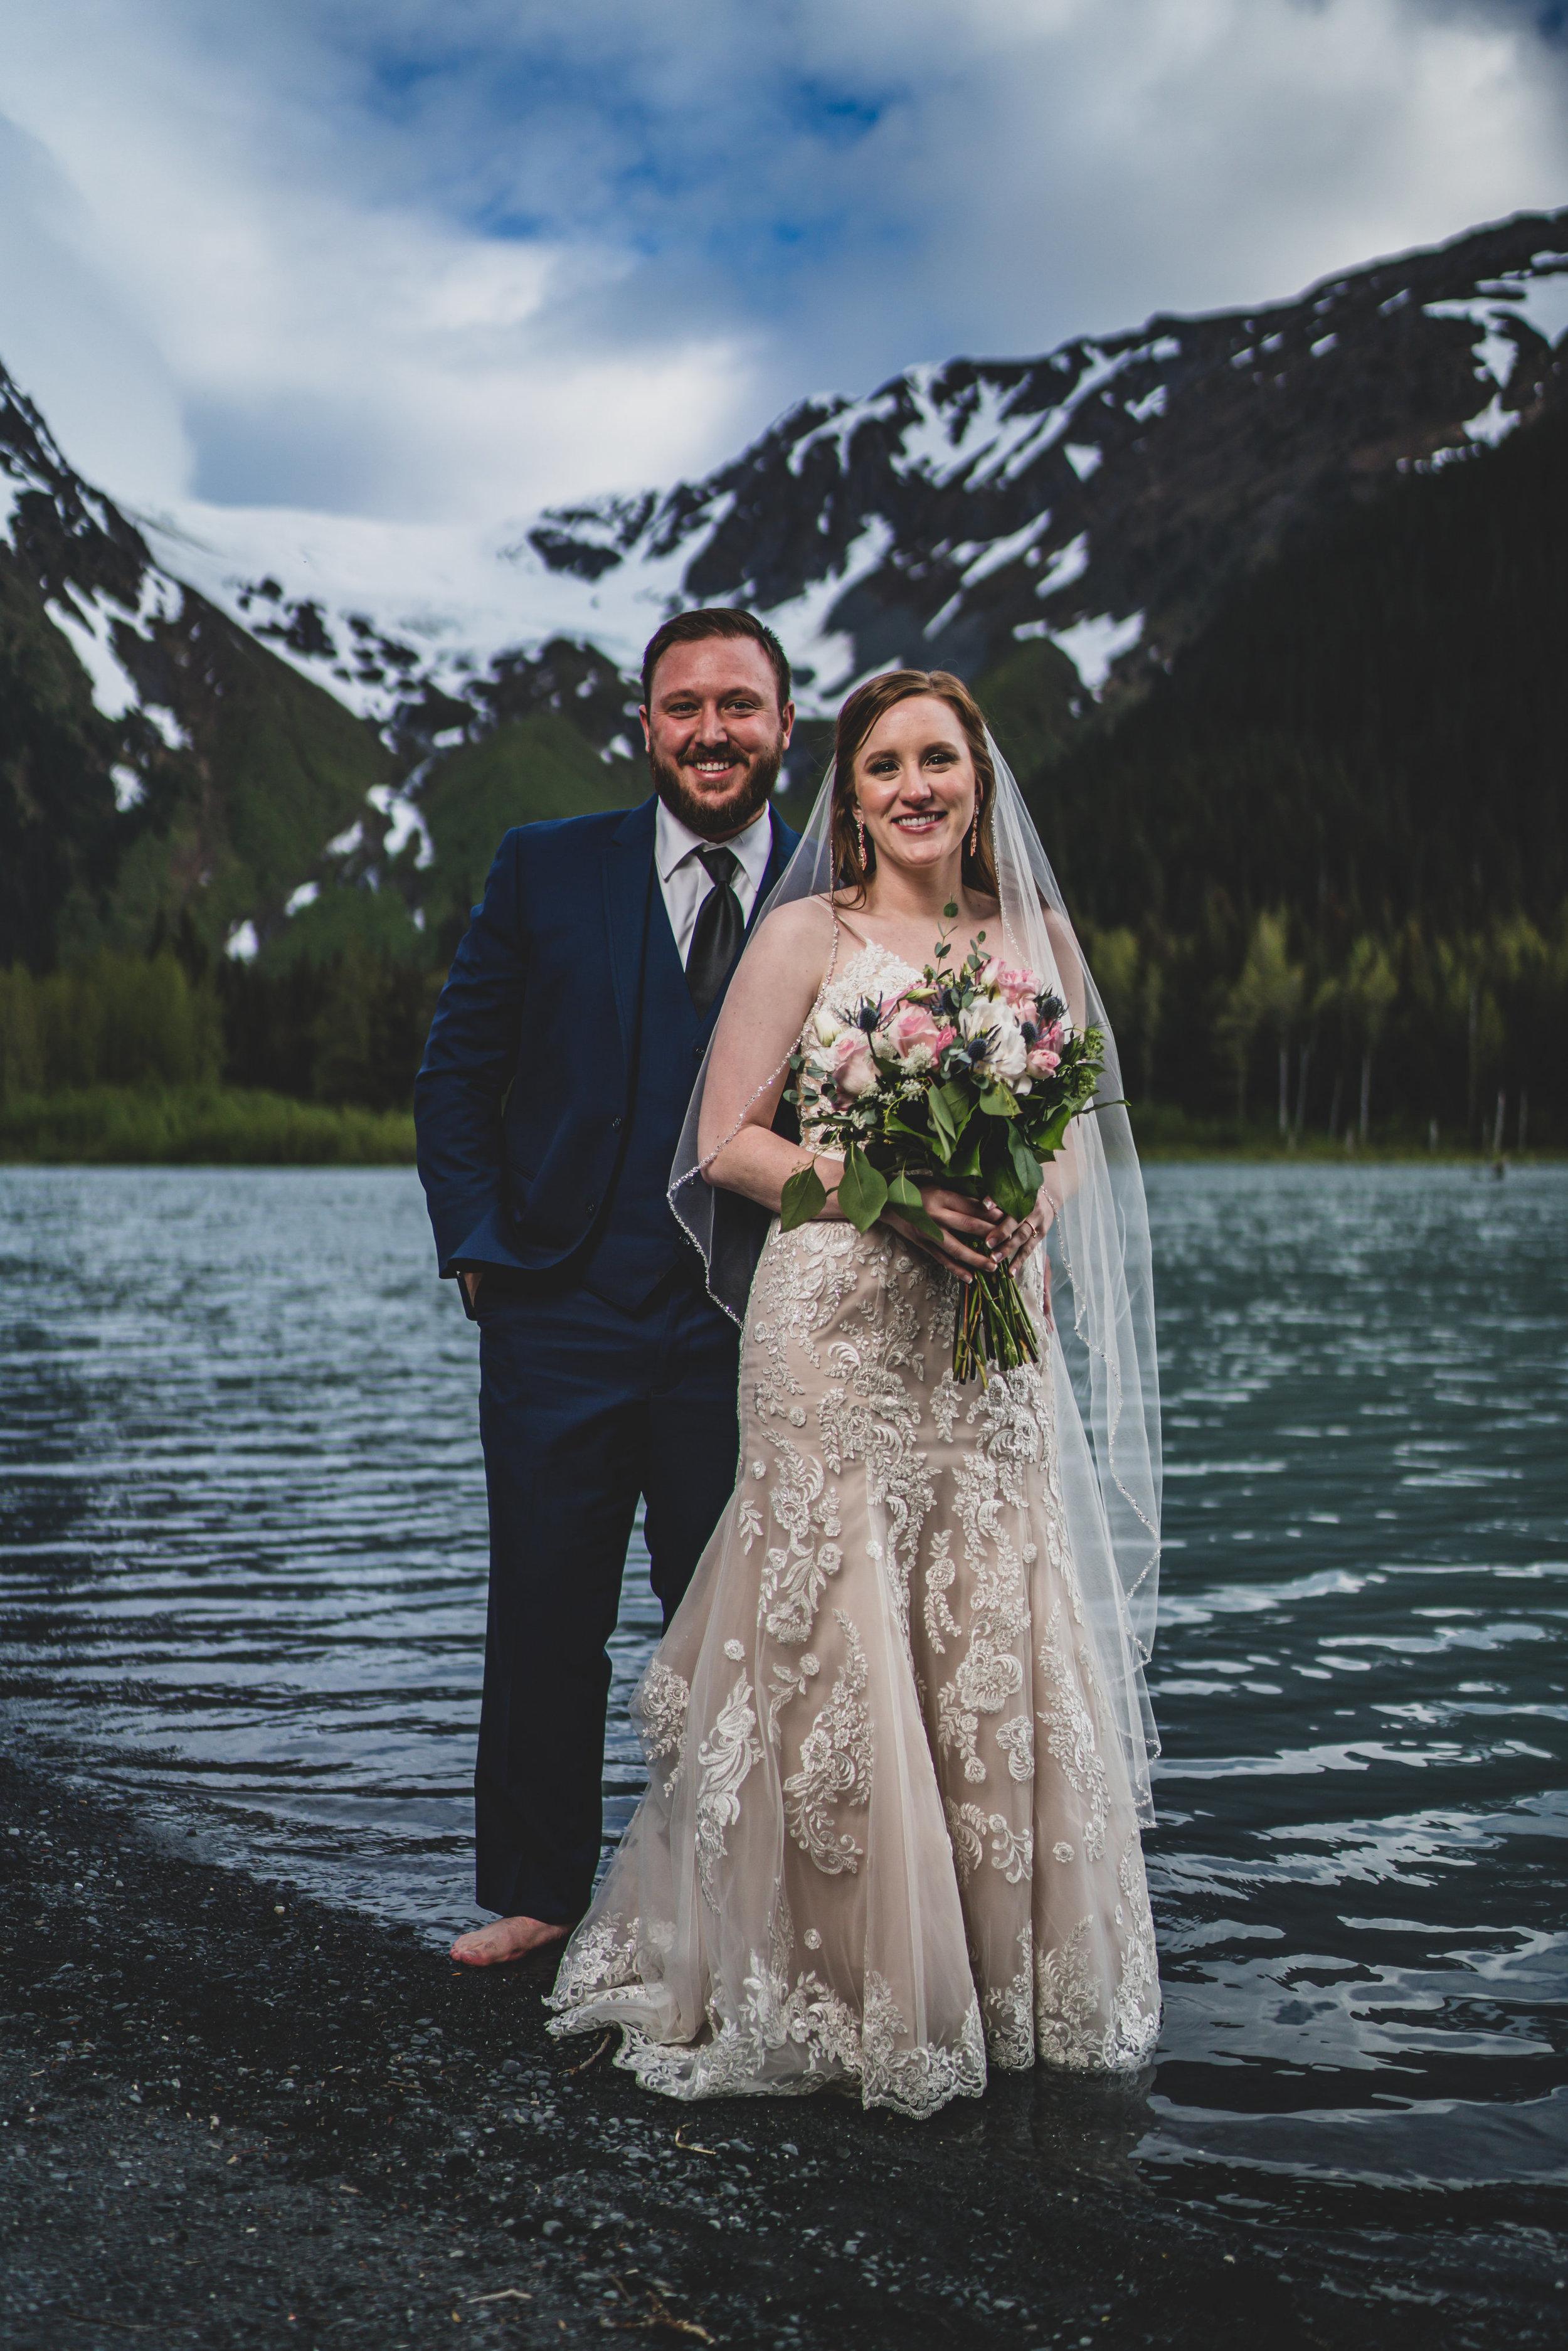 Austin and Kiley Wedding-06 Glacier Water-0031.jpg